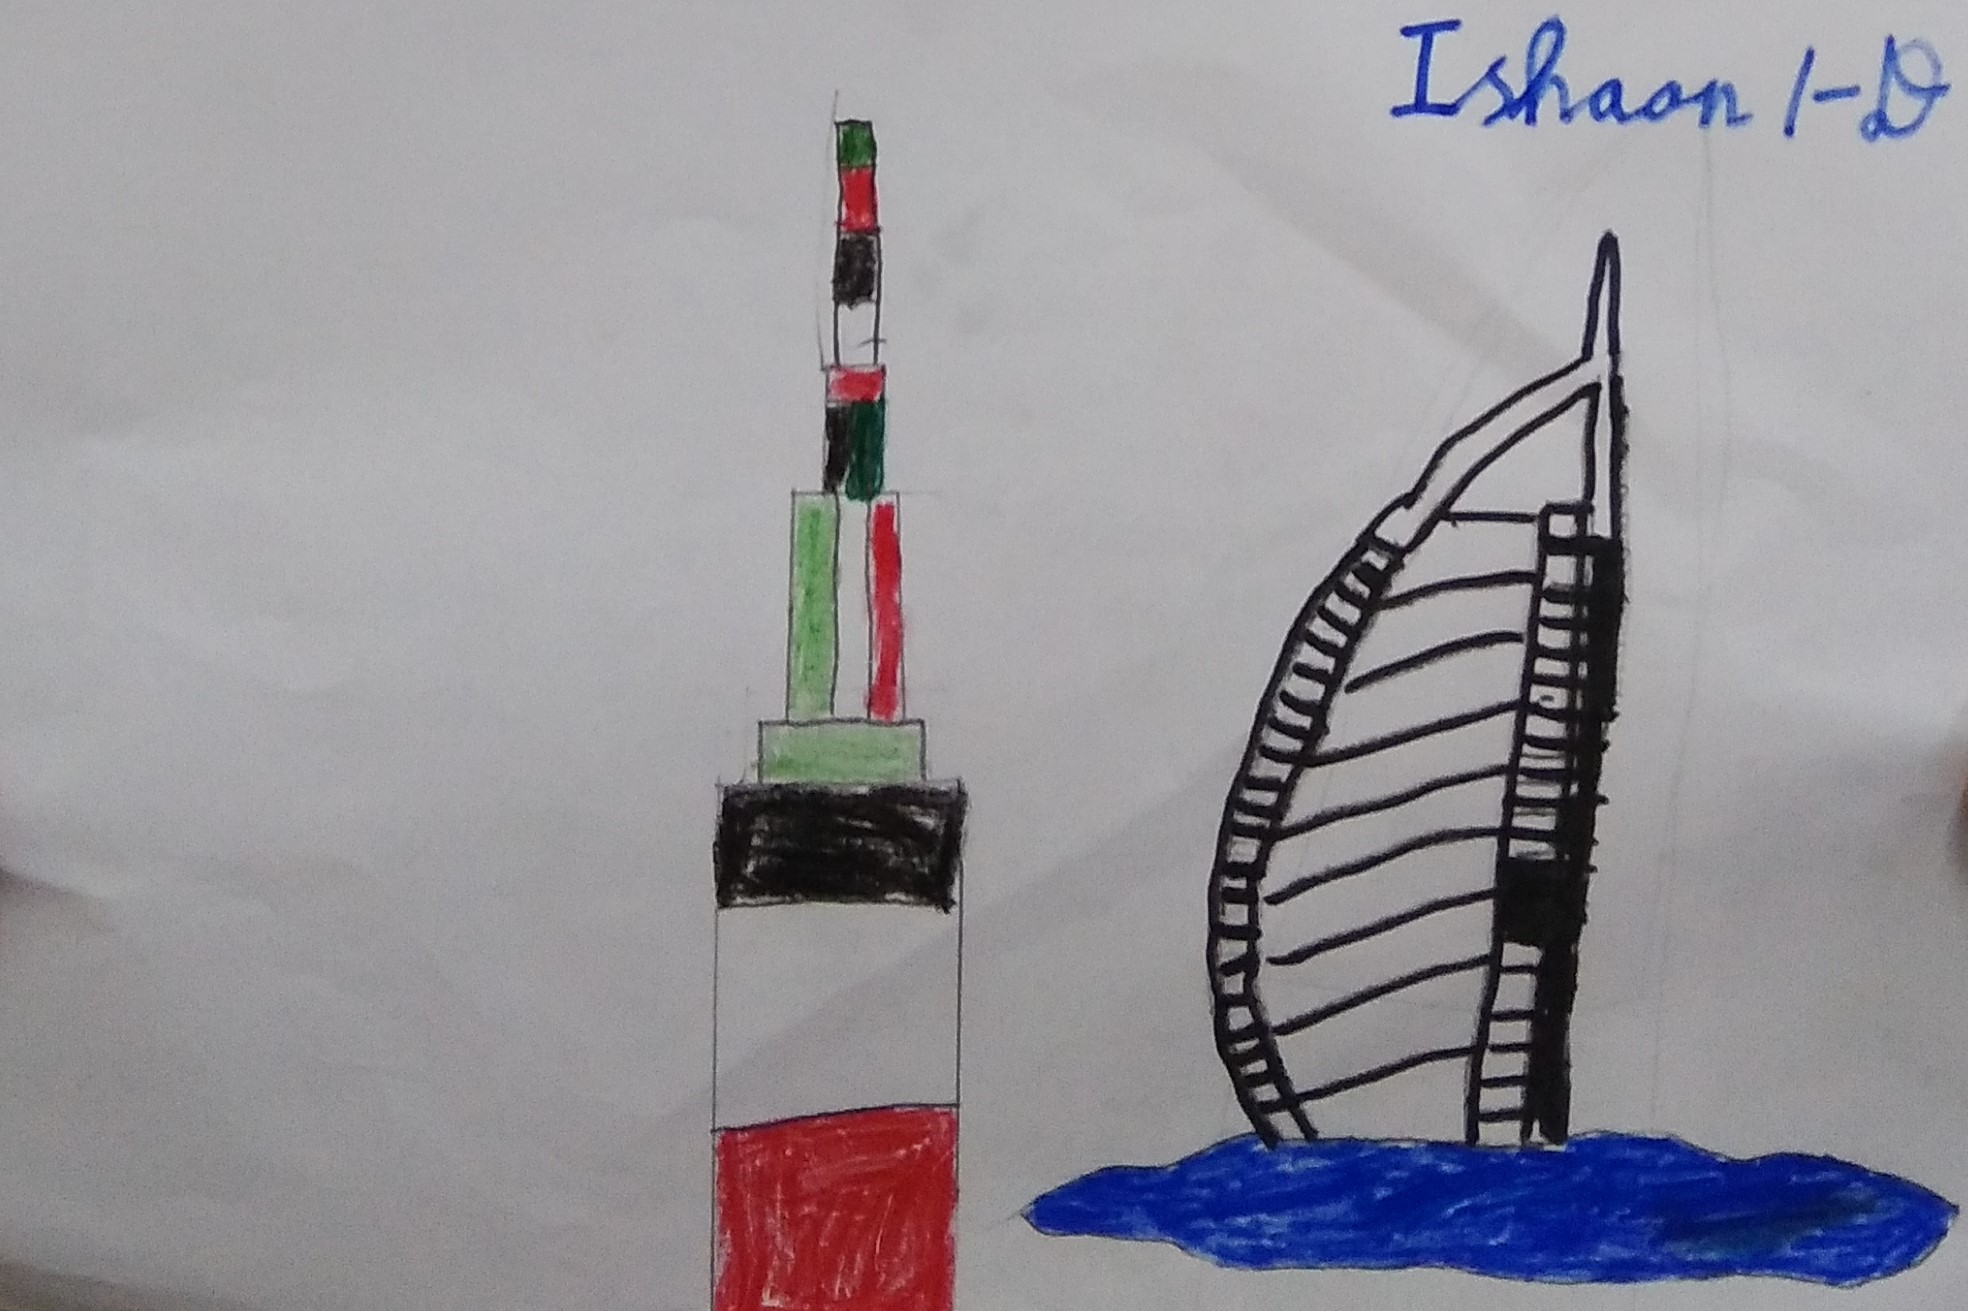 by Ishaan Bhardwaj